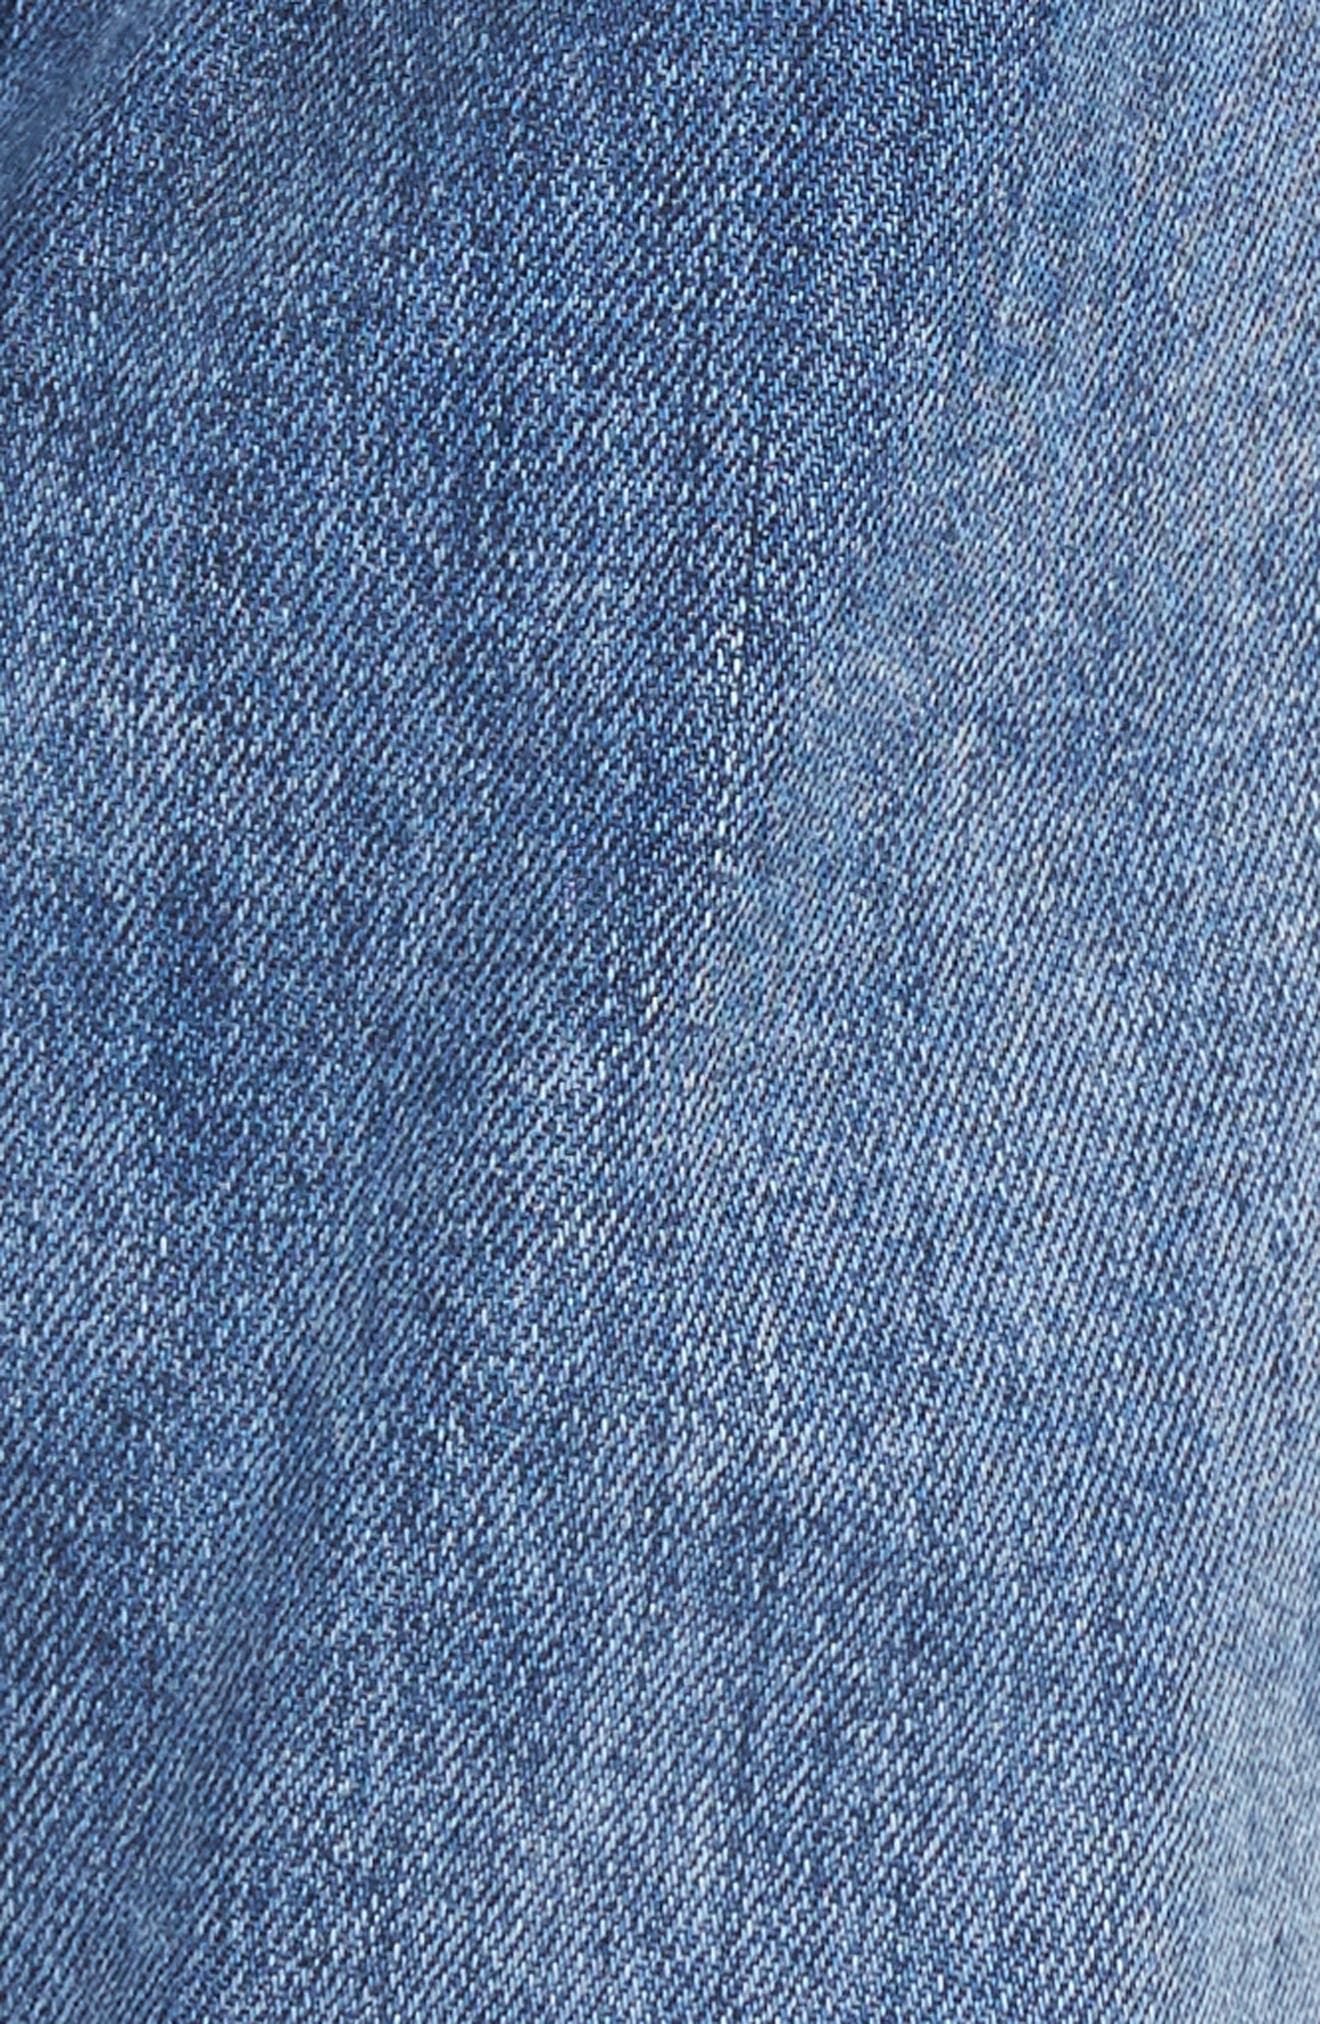 Tuckers High Waist Straight Leg Jeans,                             Alternate thumbnail 5, color,                             456